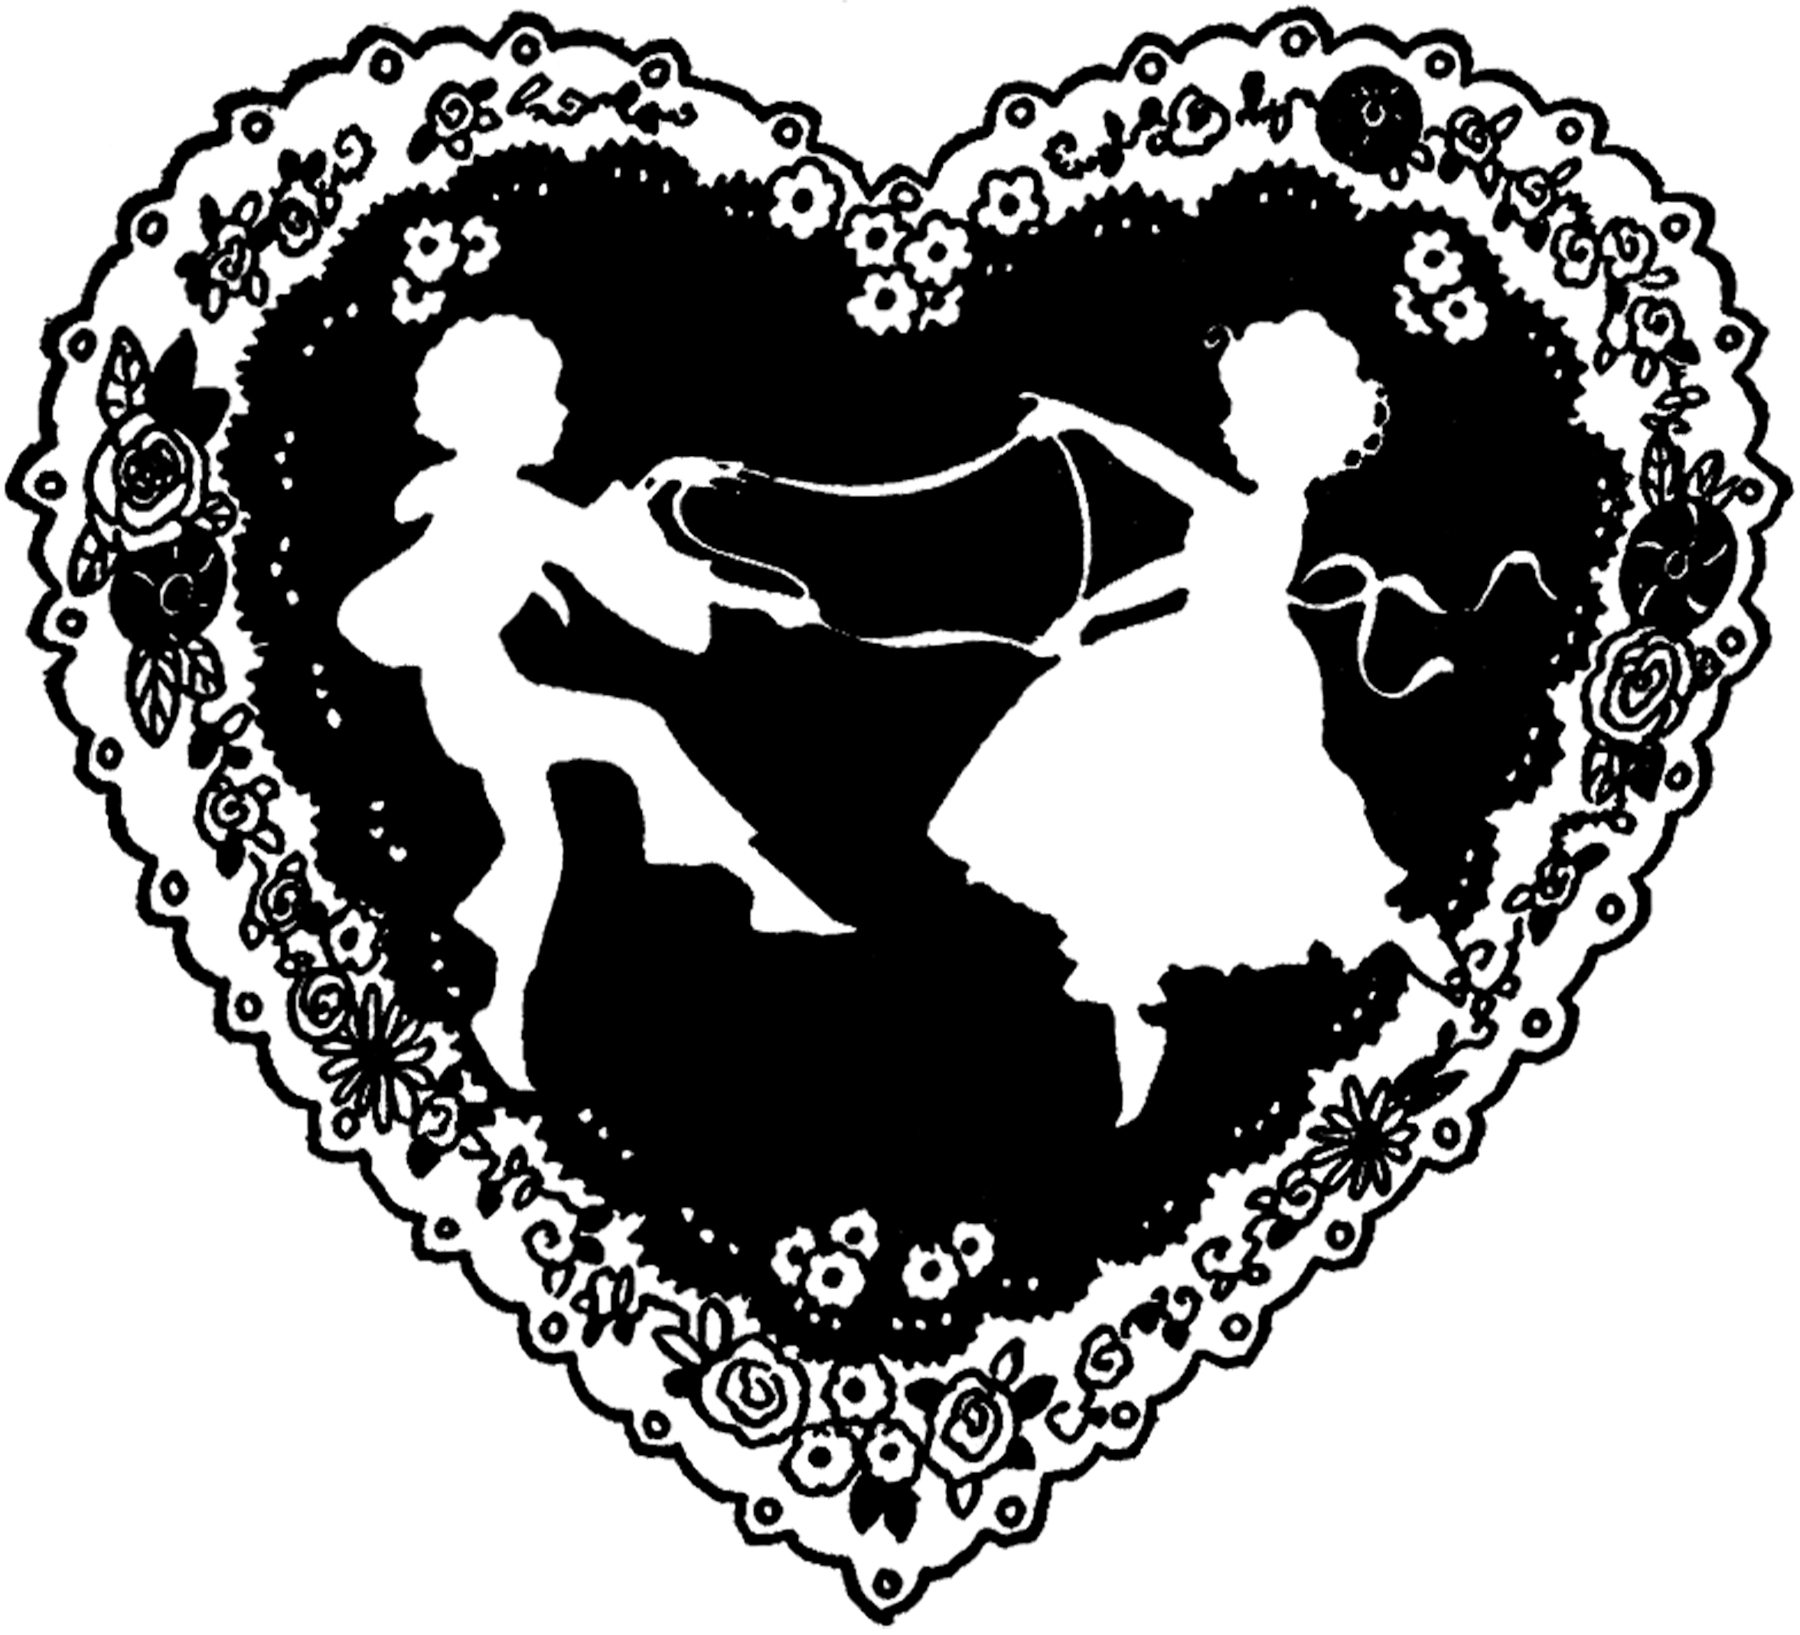 Vintage Valentine Silhouette Freebie! - The Graphics Fairy